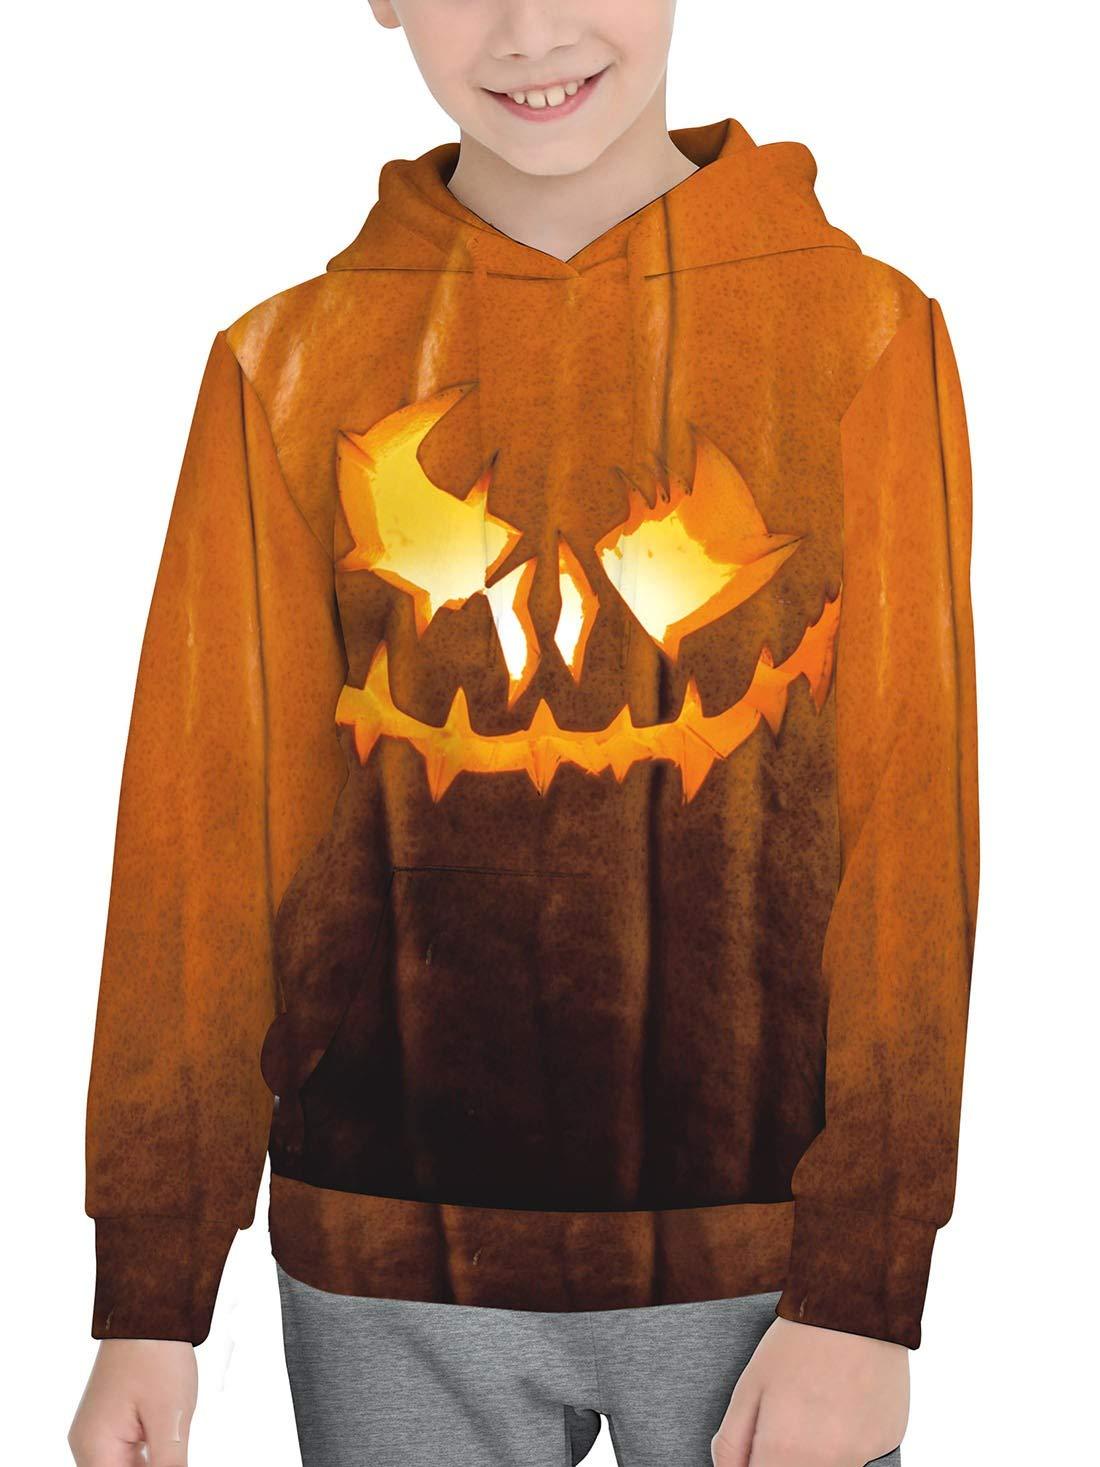 Unisex Kid's Halloween Long Sleeve Hoodies Graphic Pumpkin Printing Sweatshirts Yellow Pullover Tops 2-4T